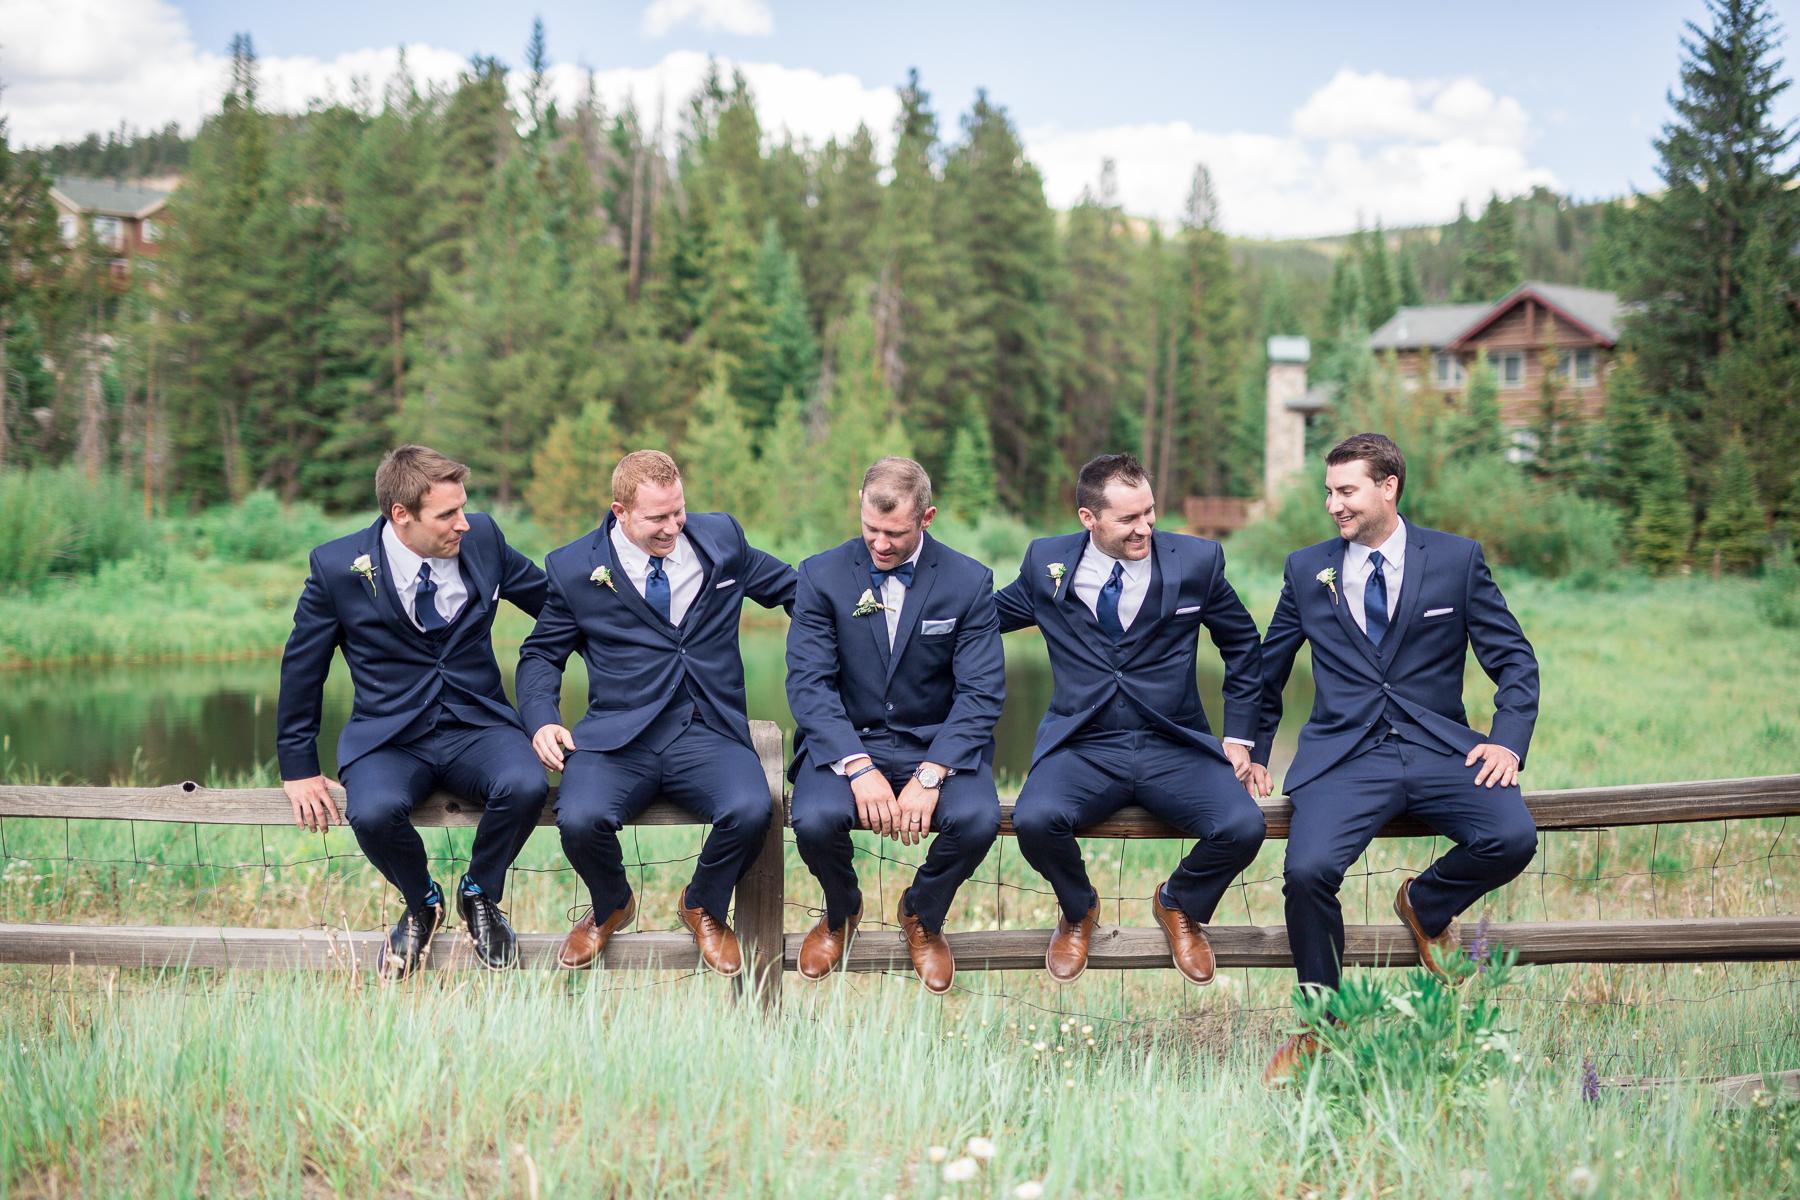 StaciDesign-Colorado-Wedding-4908.jpg